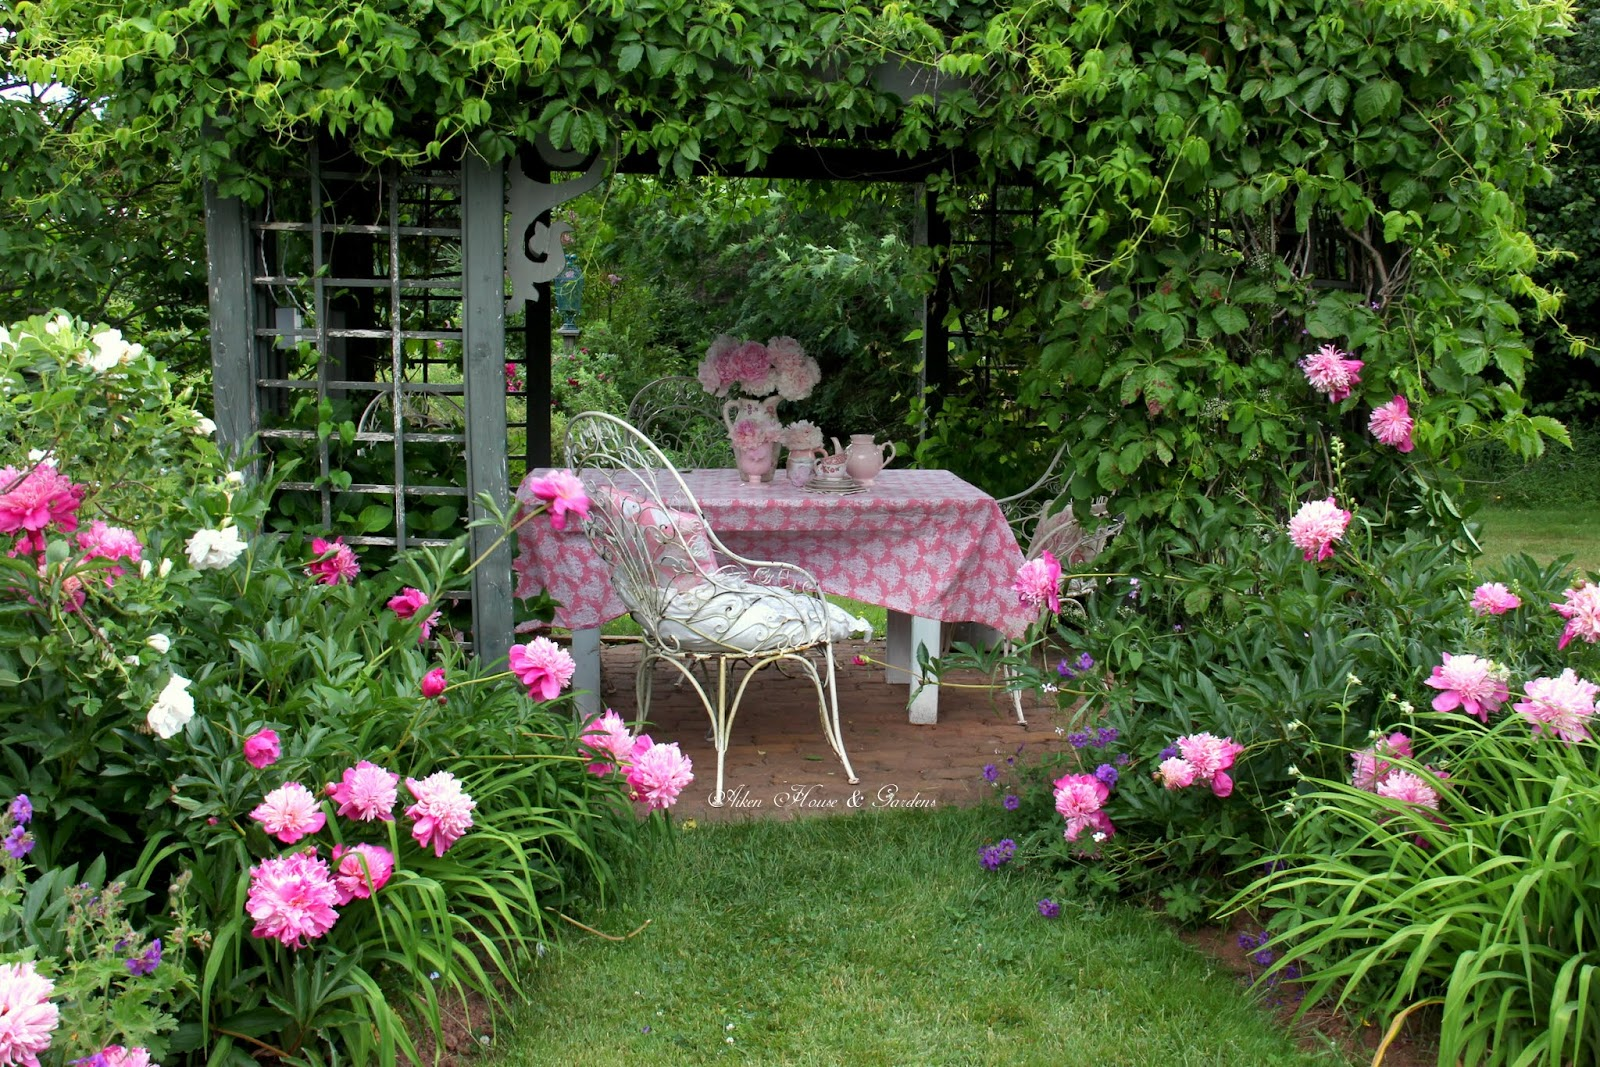 aiken house gardens sunday afternoon tea in the terrace. Black Bedroom Furniture Sets. Home Design Ideas